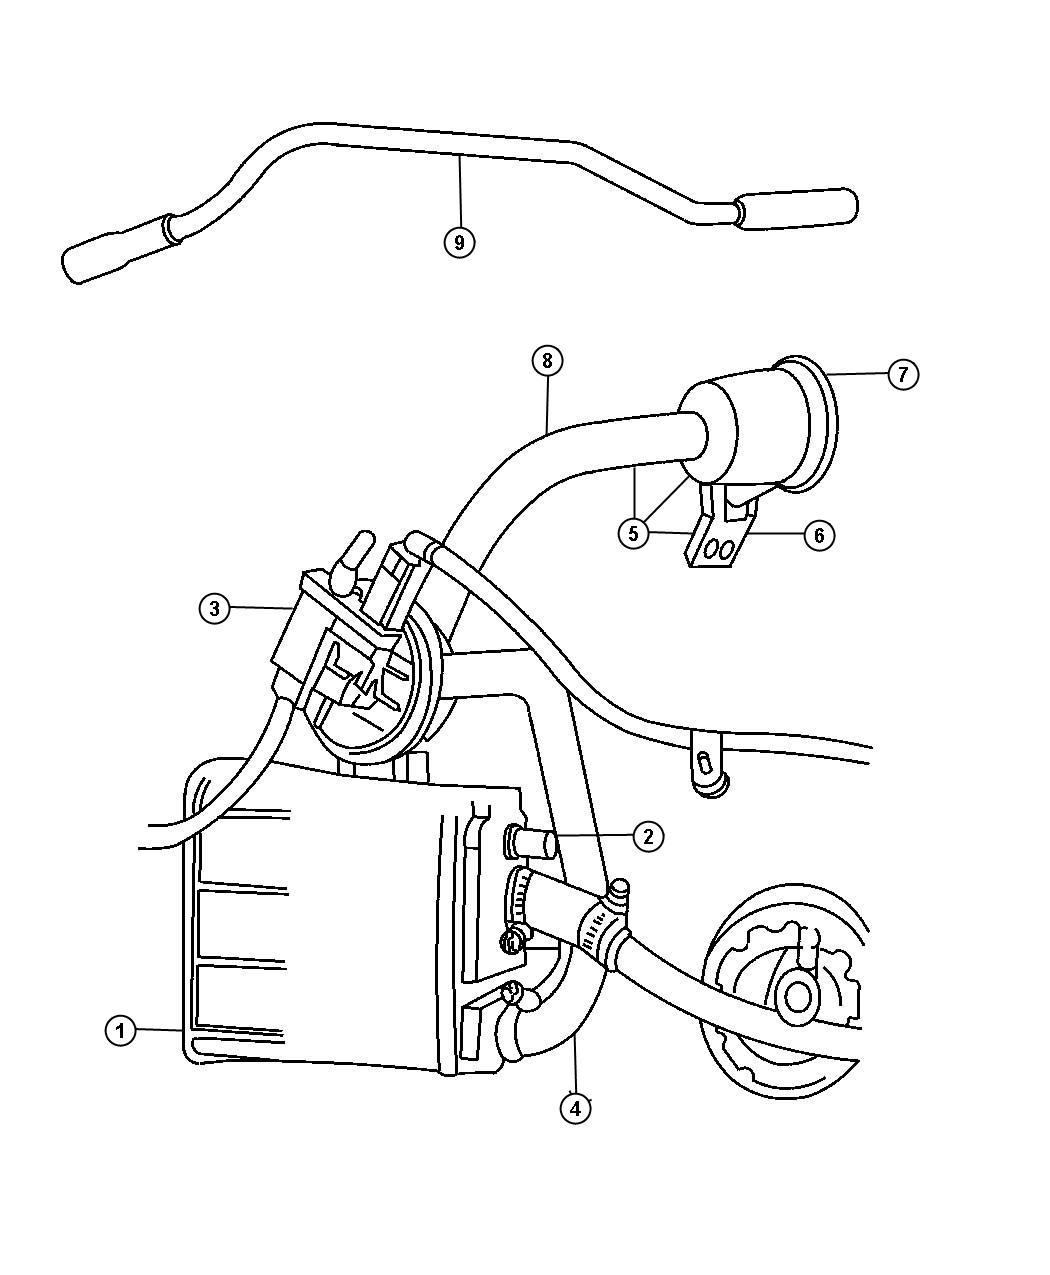 2010 pontiac g6 fuel pump wiring diagram